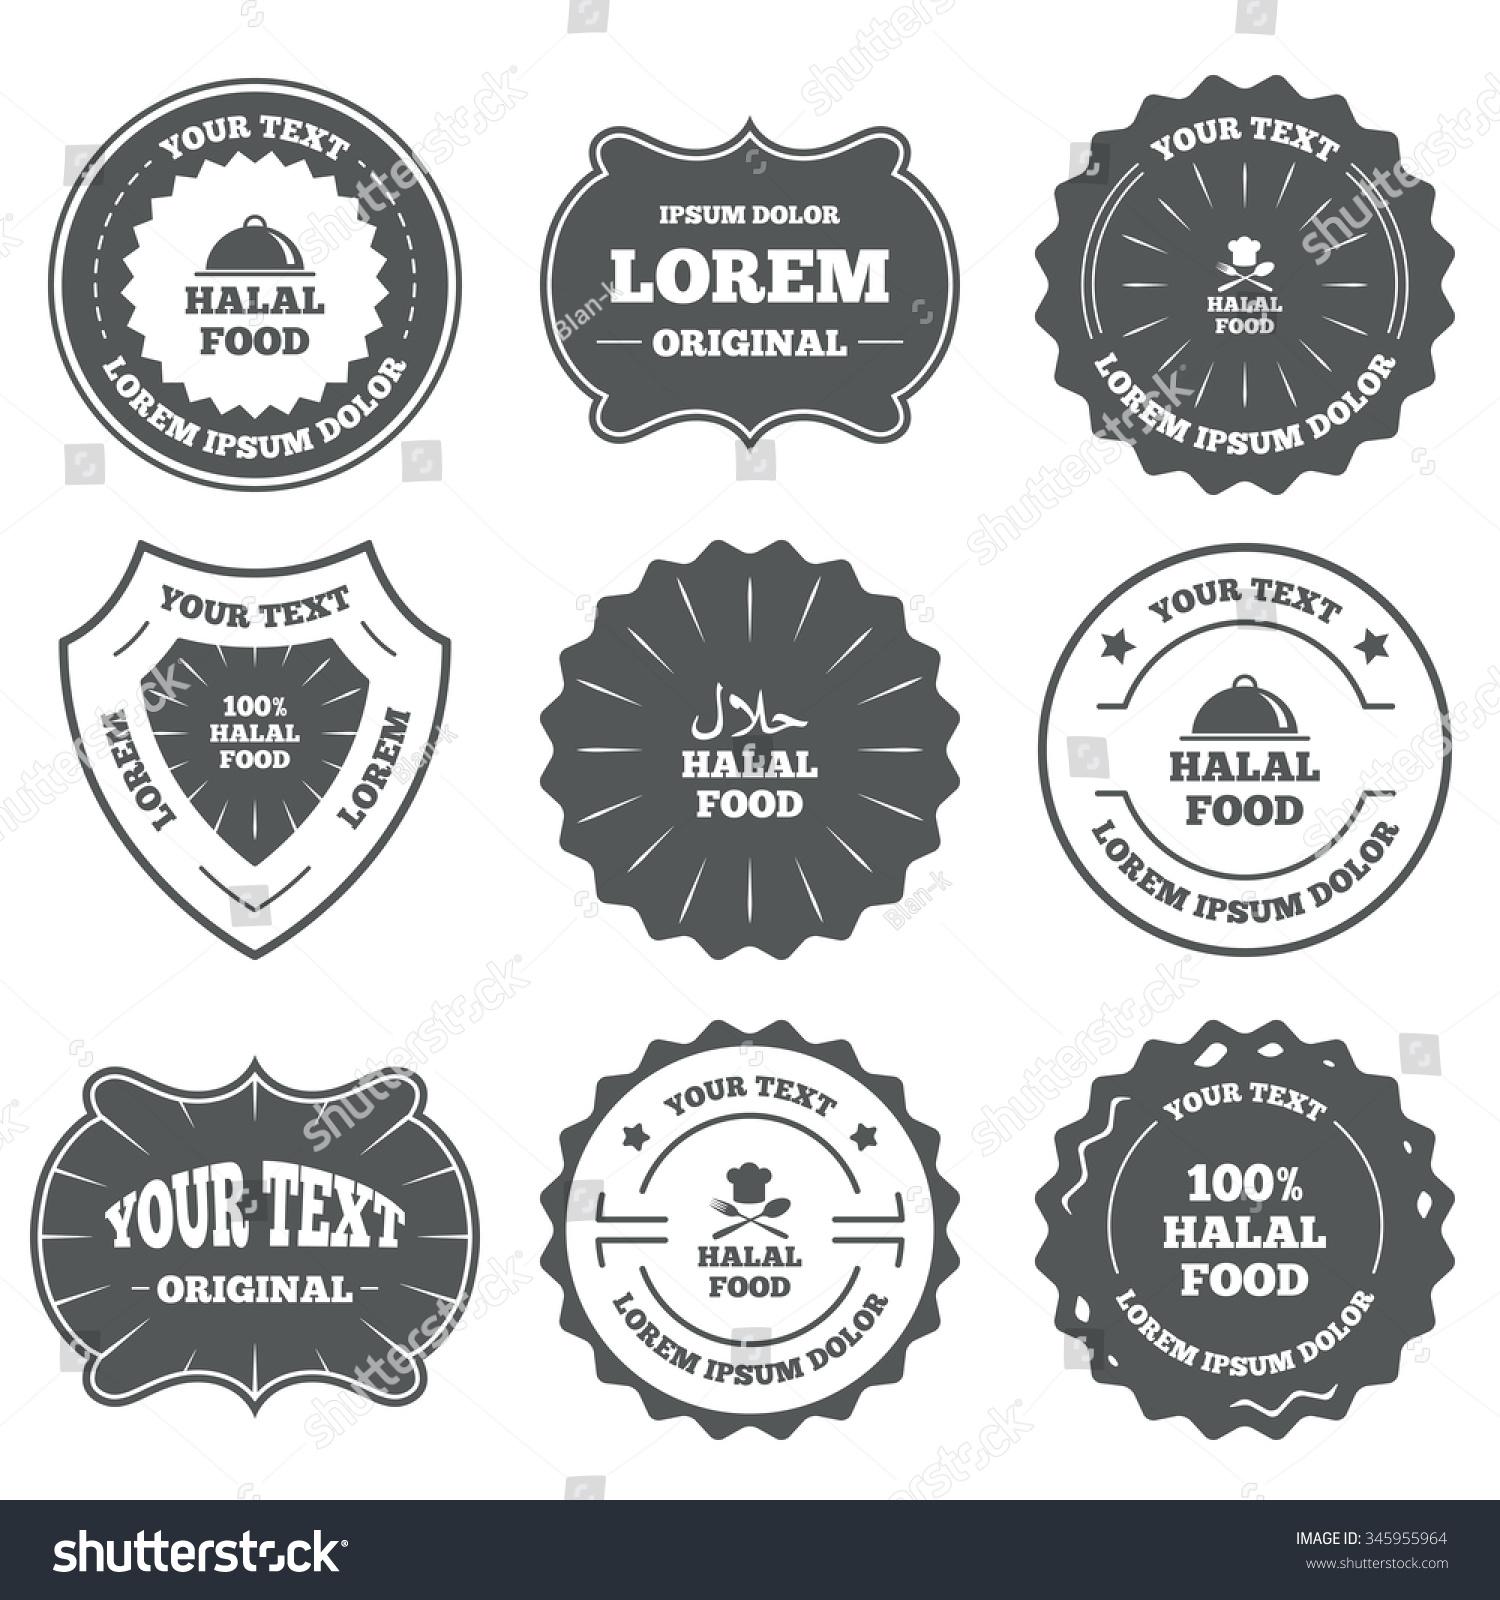 Vintage emblems labels halal food icons stock illustration halal food icons 100 natural meal symbols chef buycottarizona